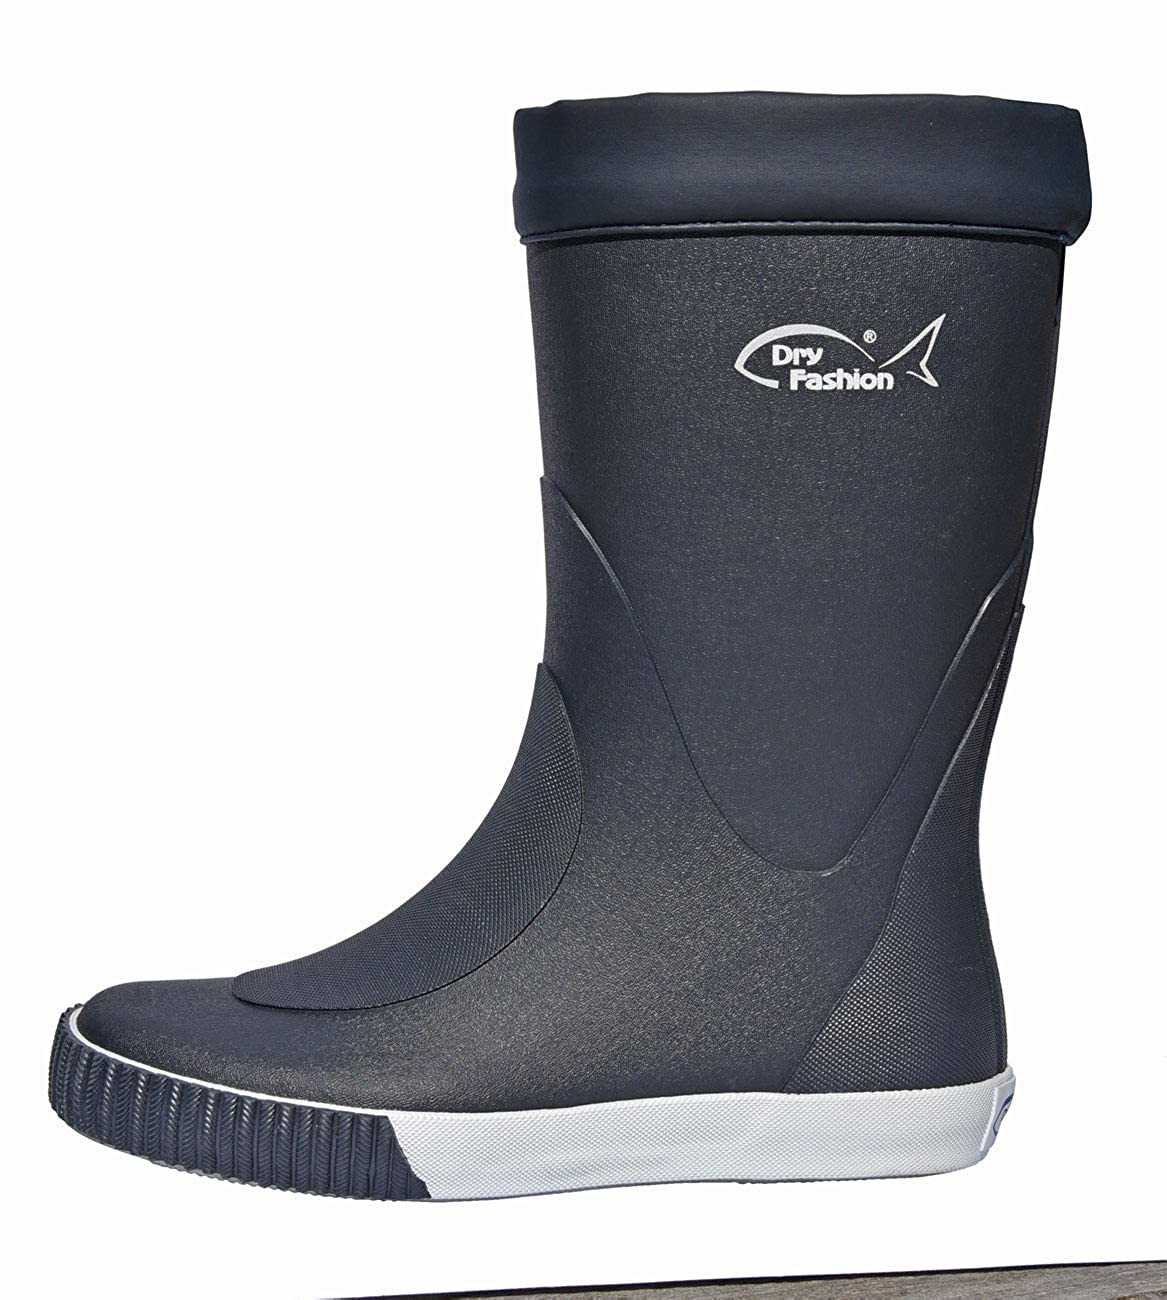 Dry Fashion Damen Herren Bootsstiefel Skipper Gummistiefel Regenstiefel Halbschaft